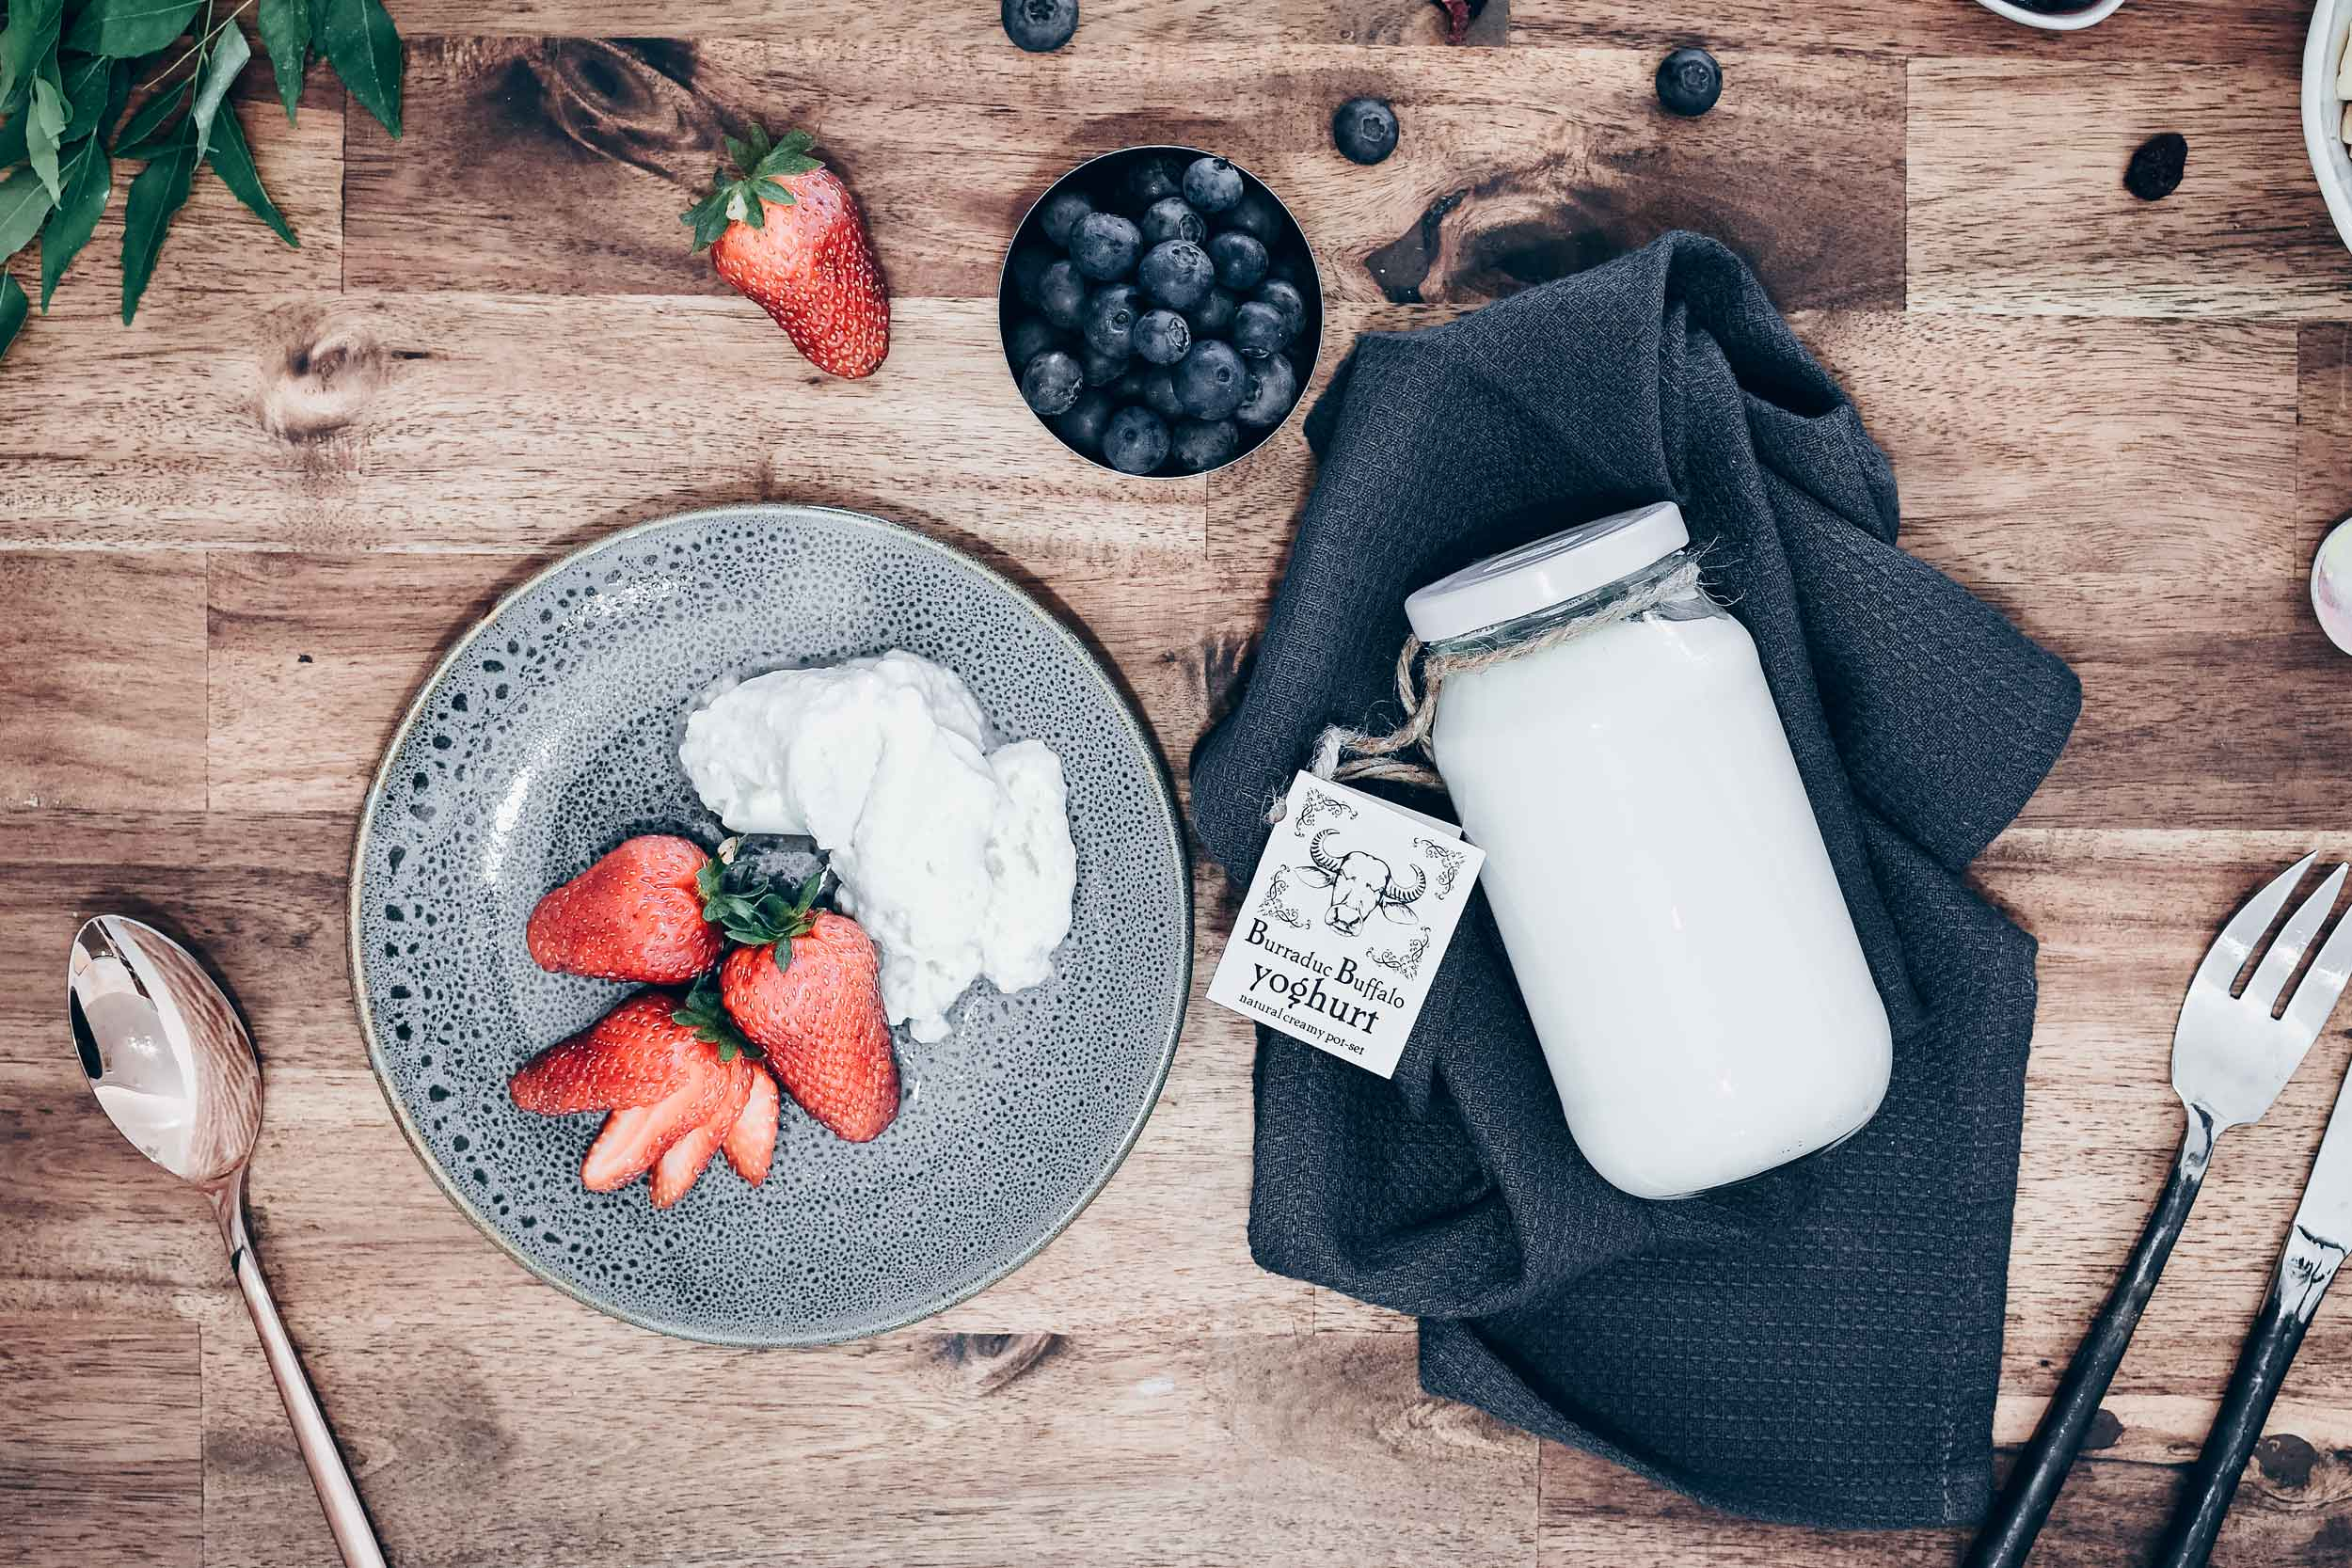 burraduc-farm-pot-set-buffalo-yoghurt.jpg